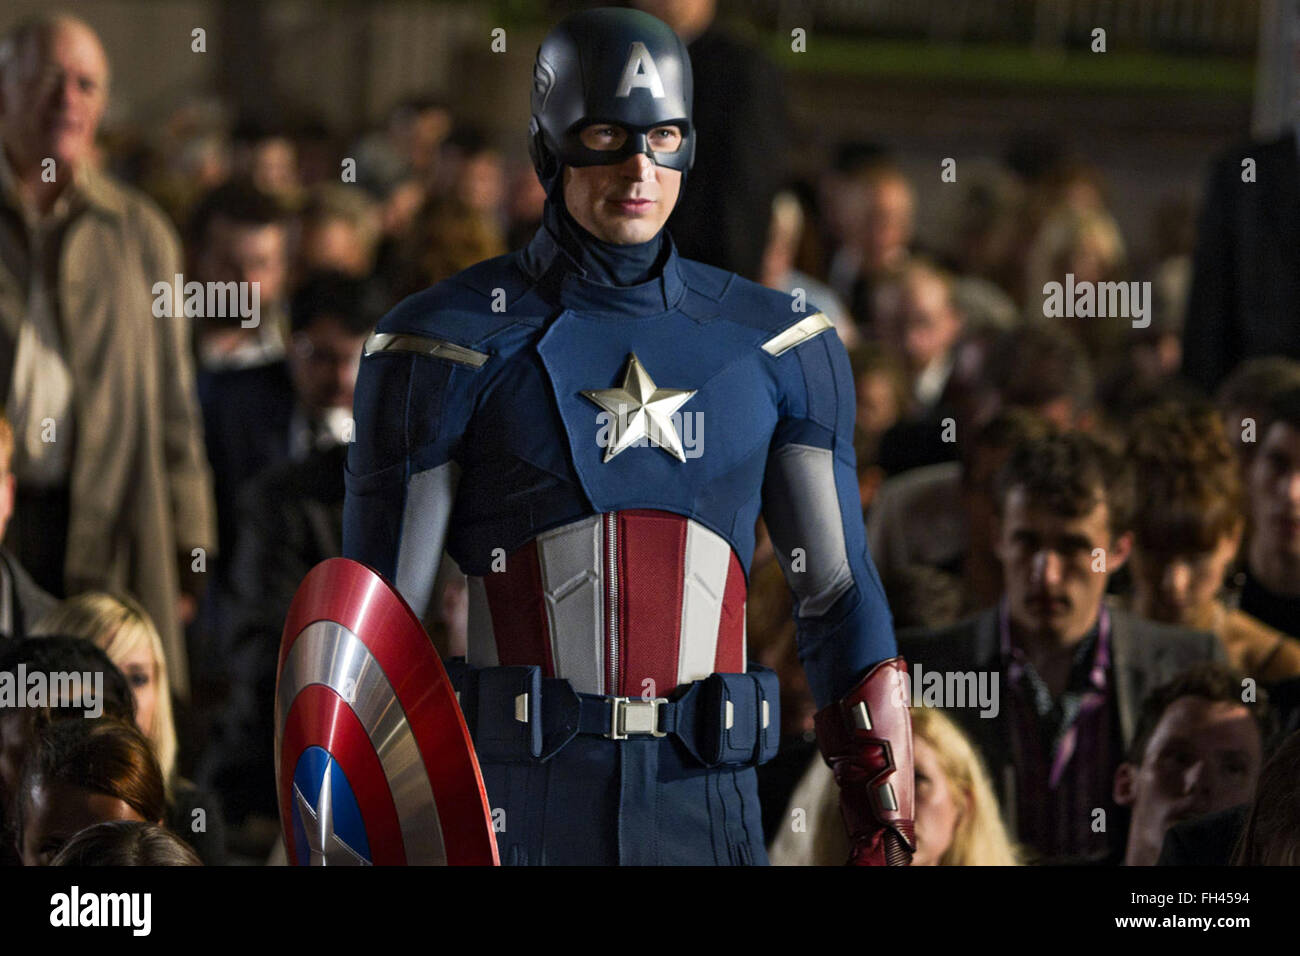 Marvel's The Avengers is a 2012 American superhero film based on the Marvel Comics superhero team of the same name. Stock Photo